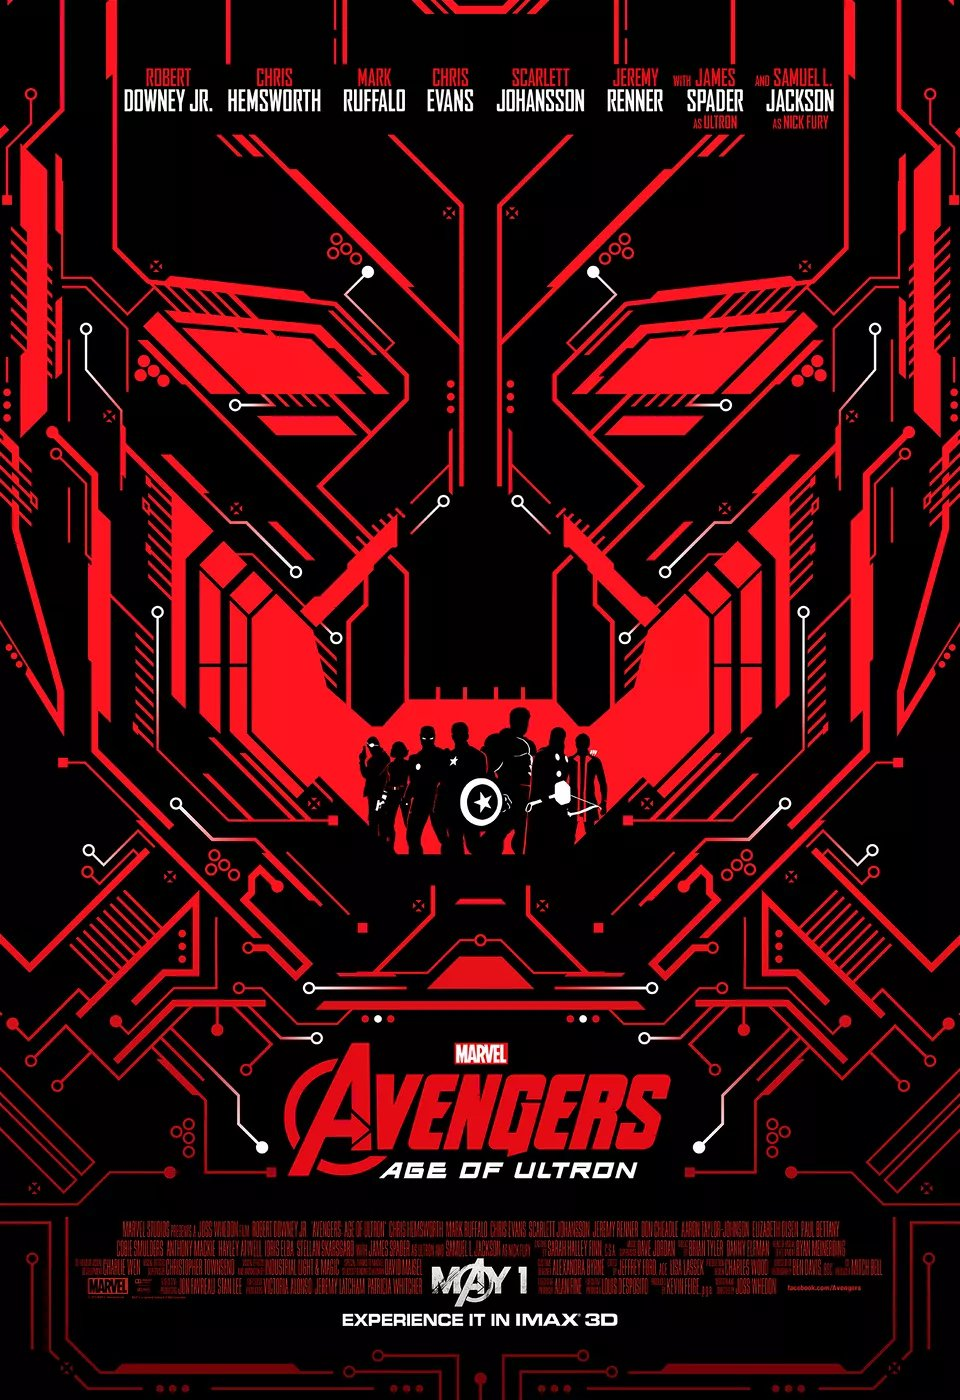 Marvels The Avengers Dvd Cover The avengers blu-ray dvd cover (2012 ...